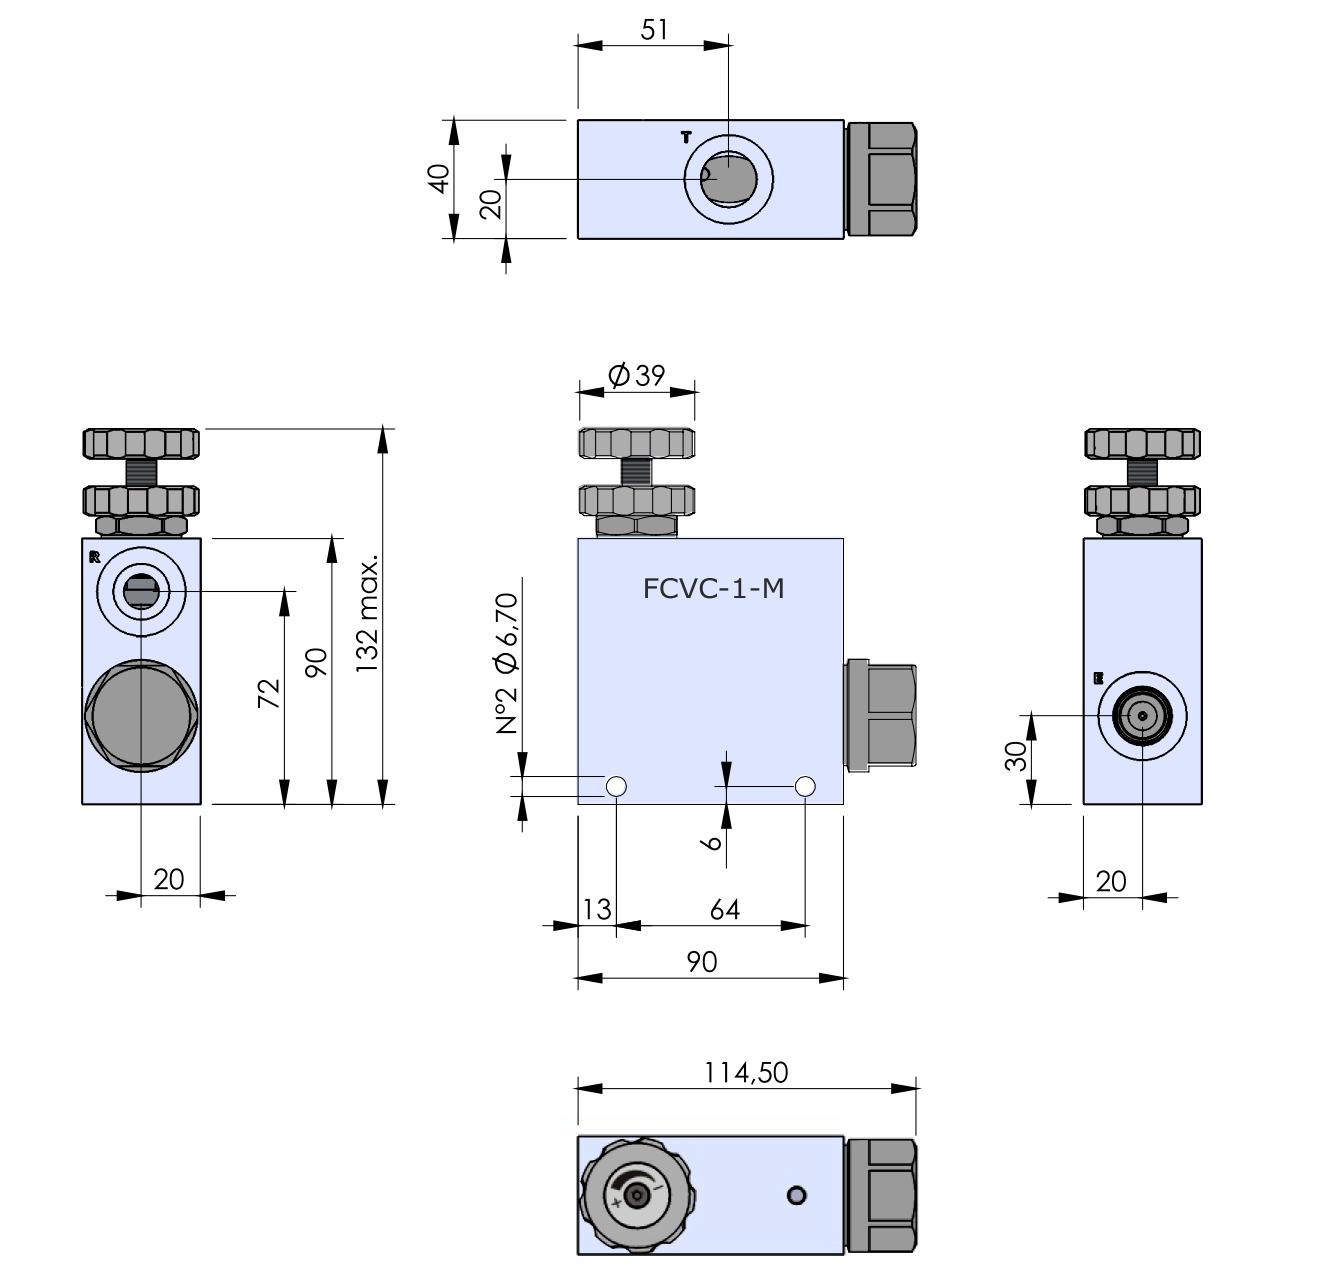 FCVC-1-M схема